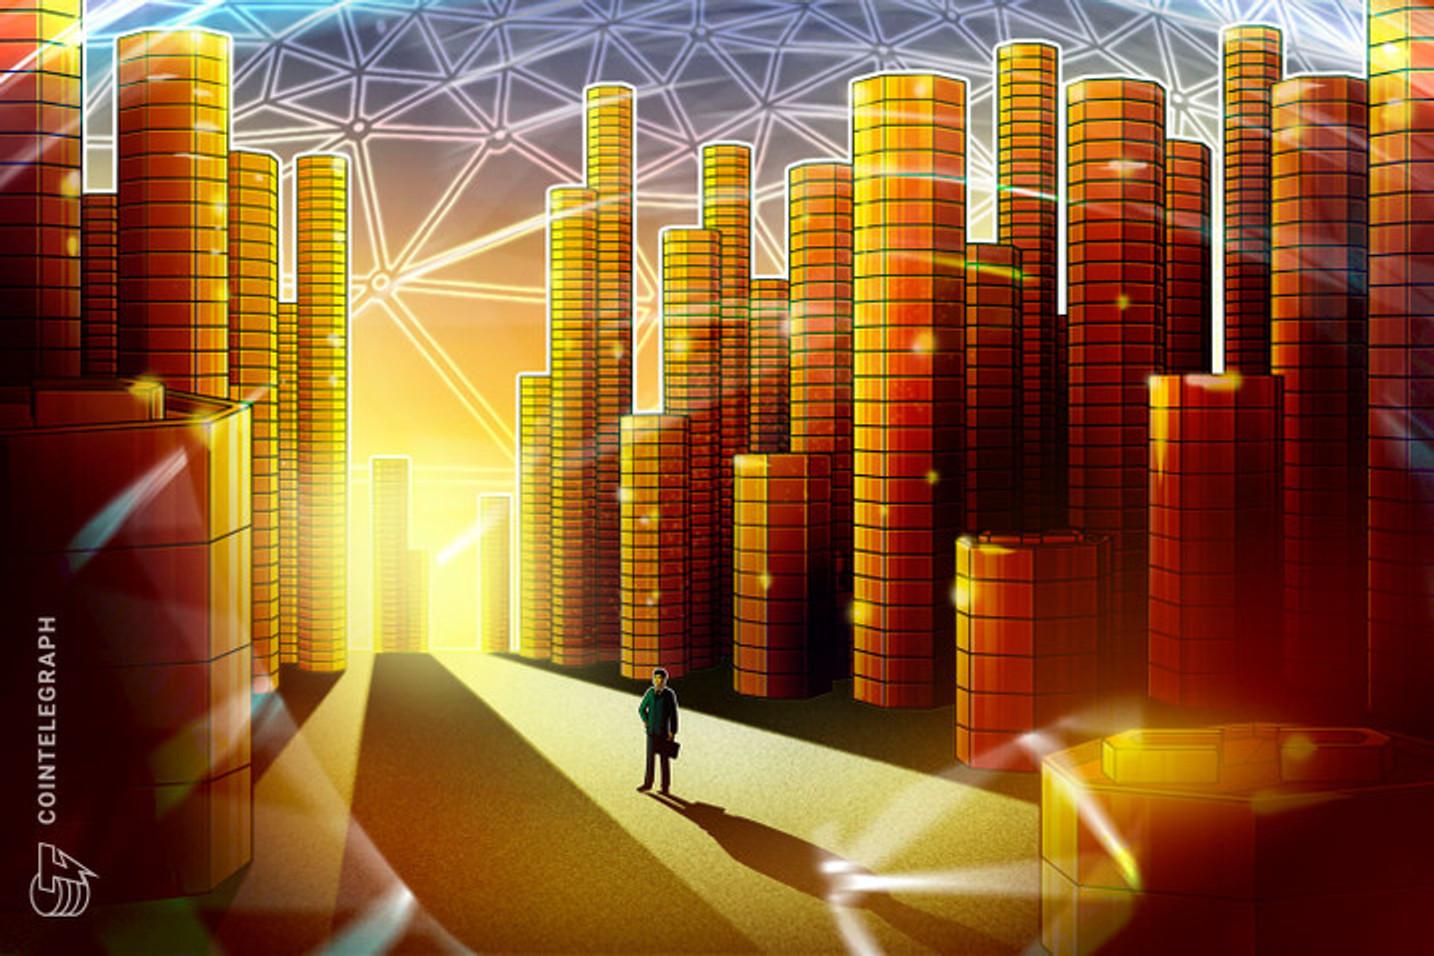 Inversor descubre estrategia que aumenta su balance de Bitcoin (BTC) en un 1.400% a través del alza de Ethereum (ETH)